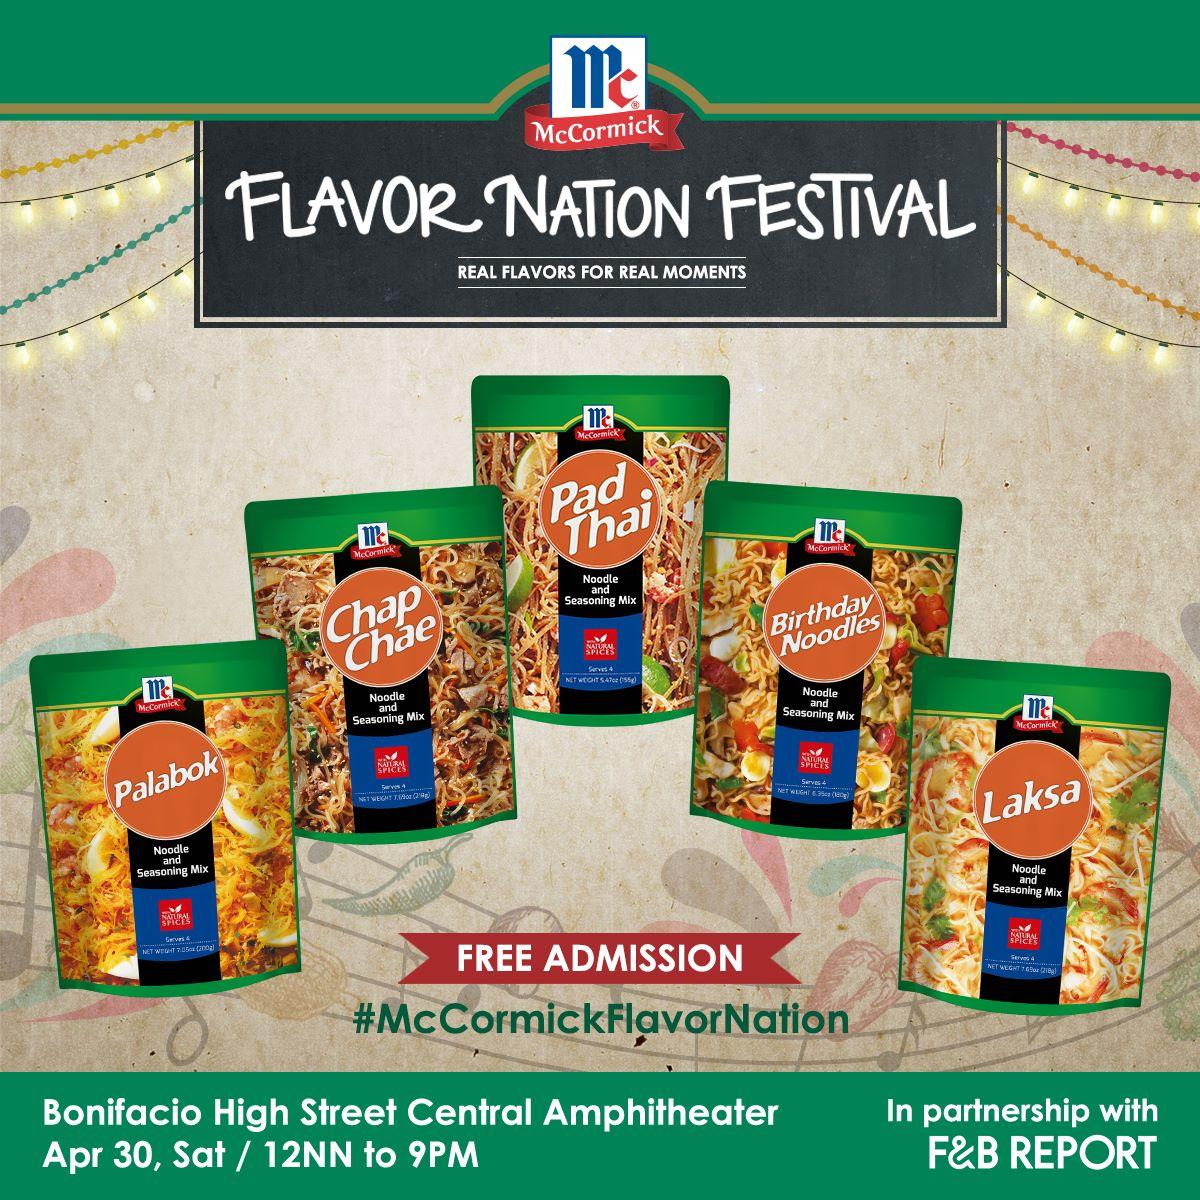 mccormick-flavor-nation-festival